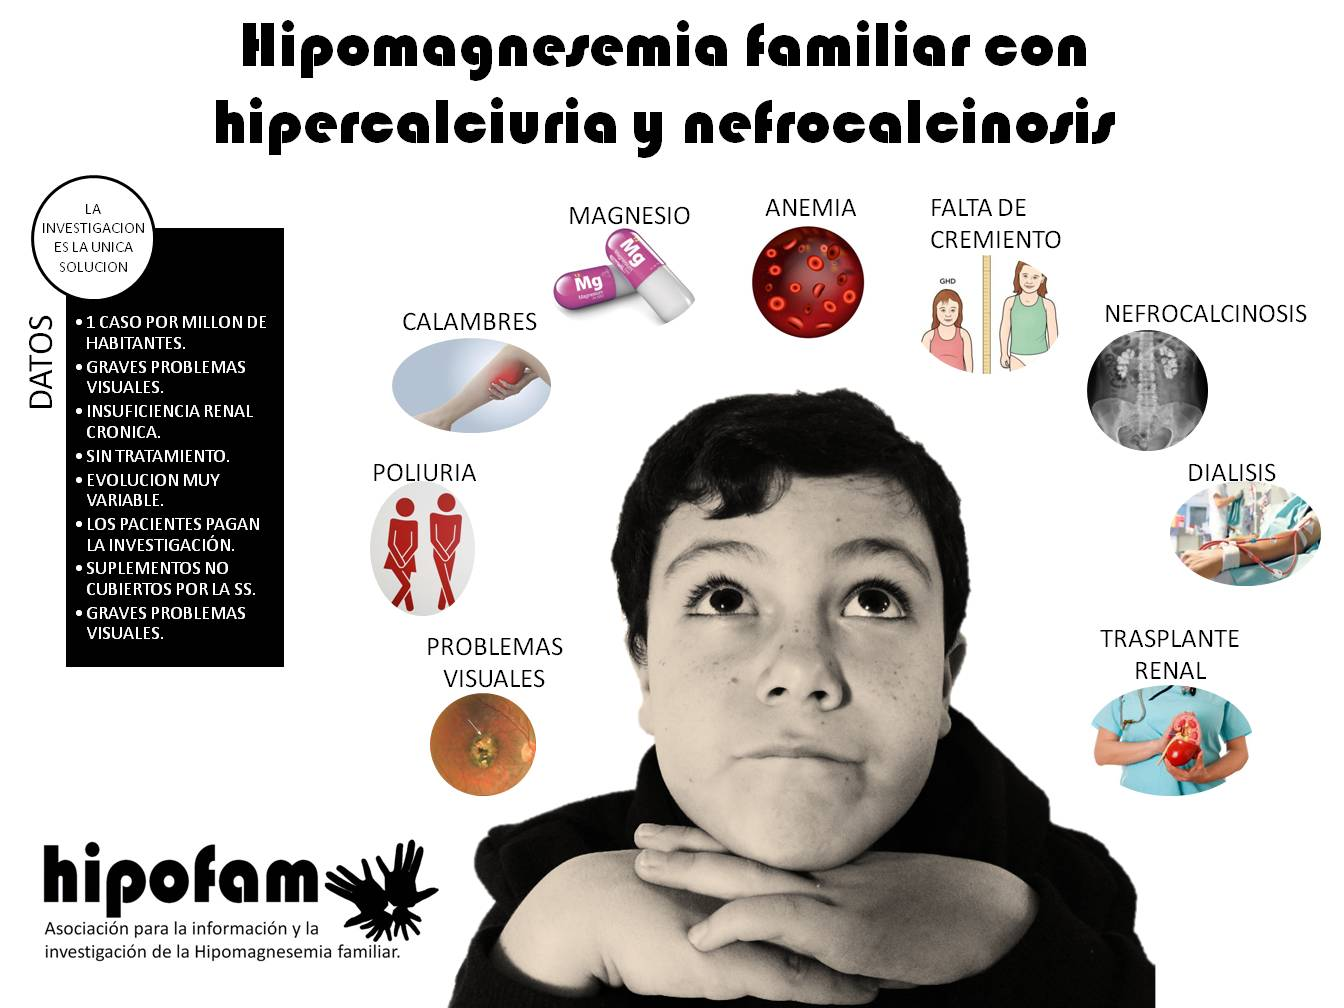 Hipomagnesemia familiar